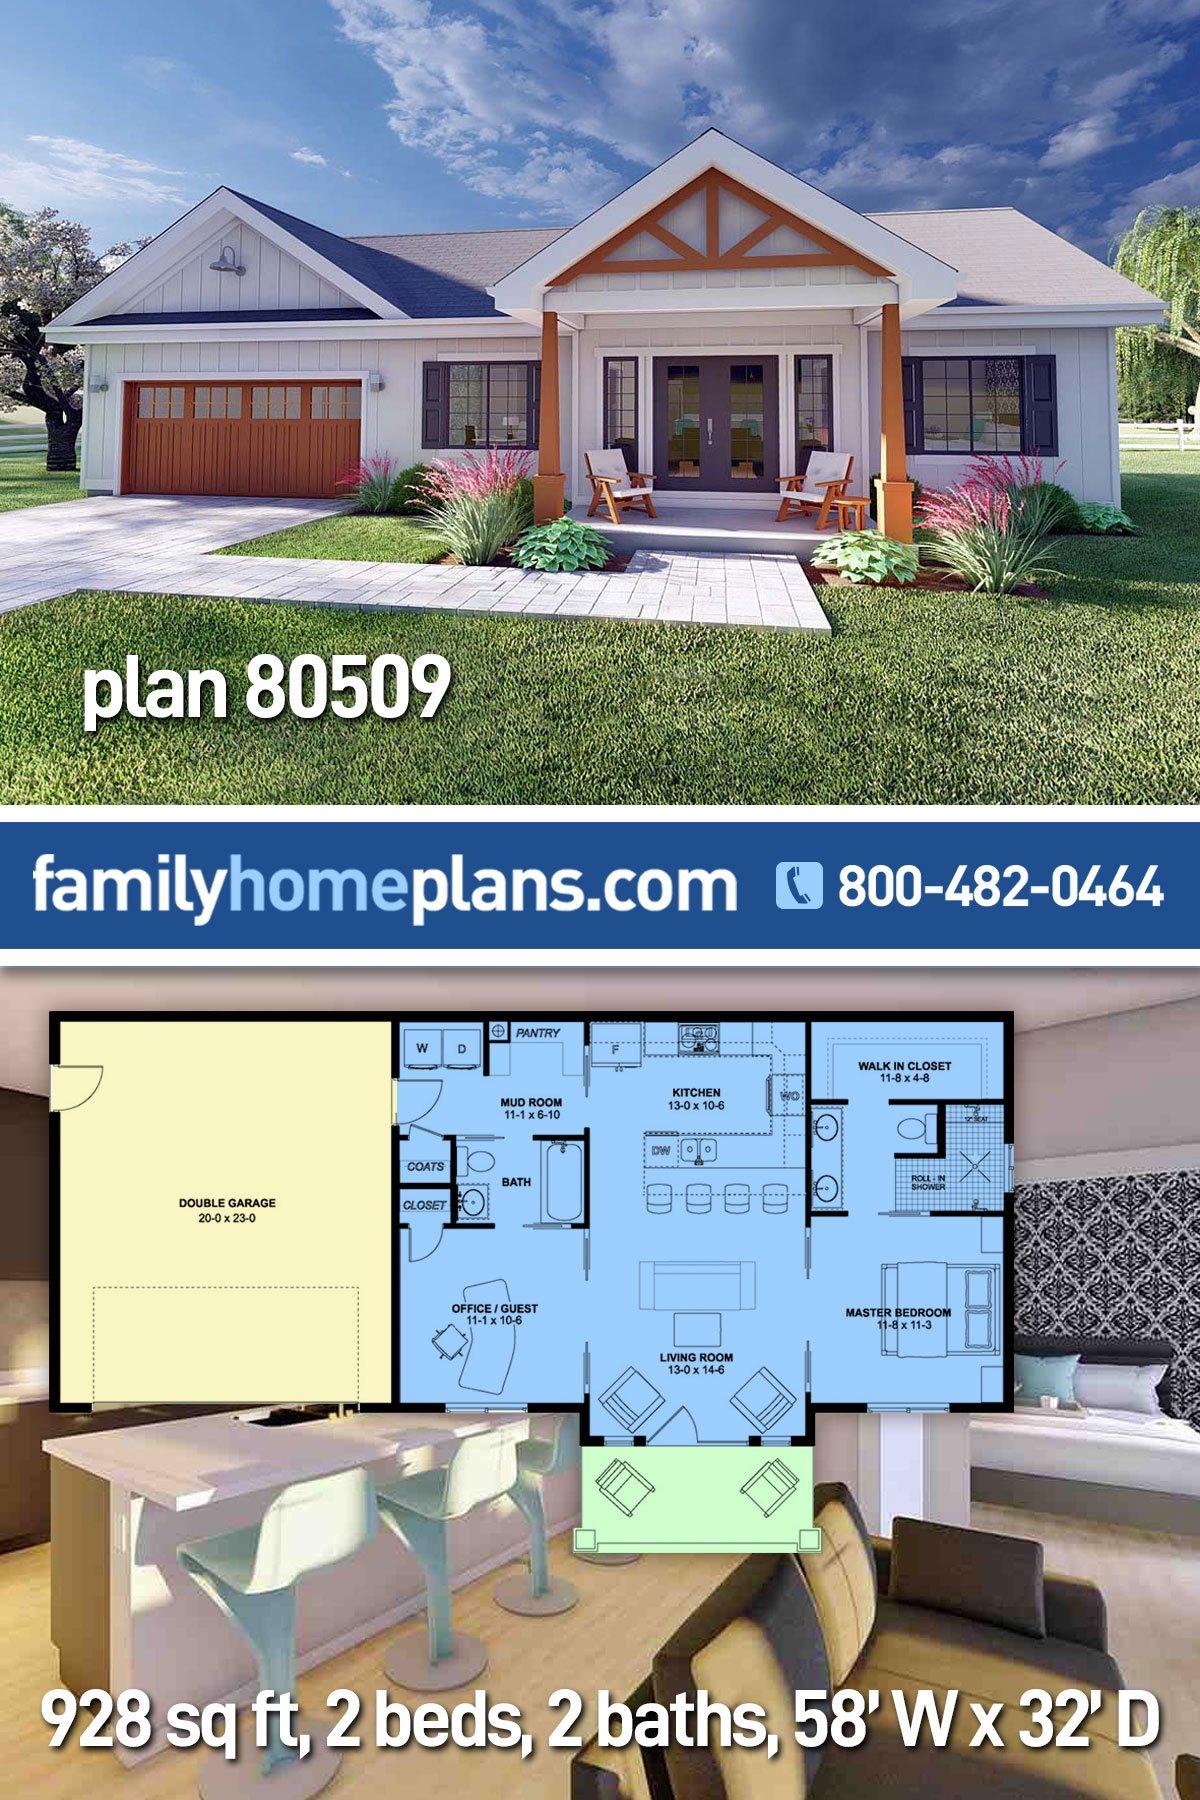 Bungalow, Cottage, Farmhouse, Ranch House Plan 80509 with 2 Beds, 2 Baths, 2 Car Garage